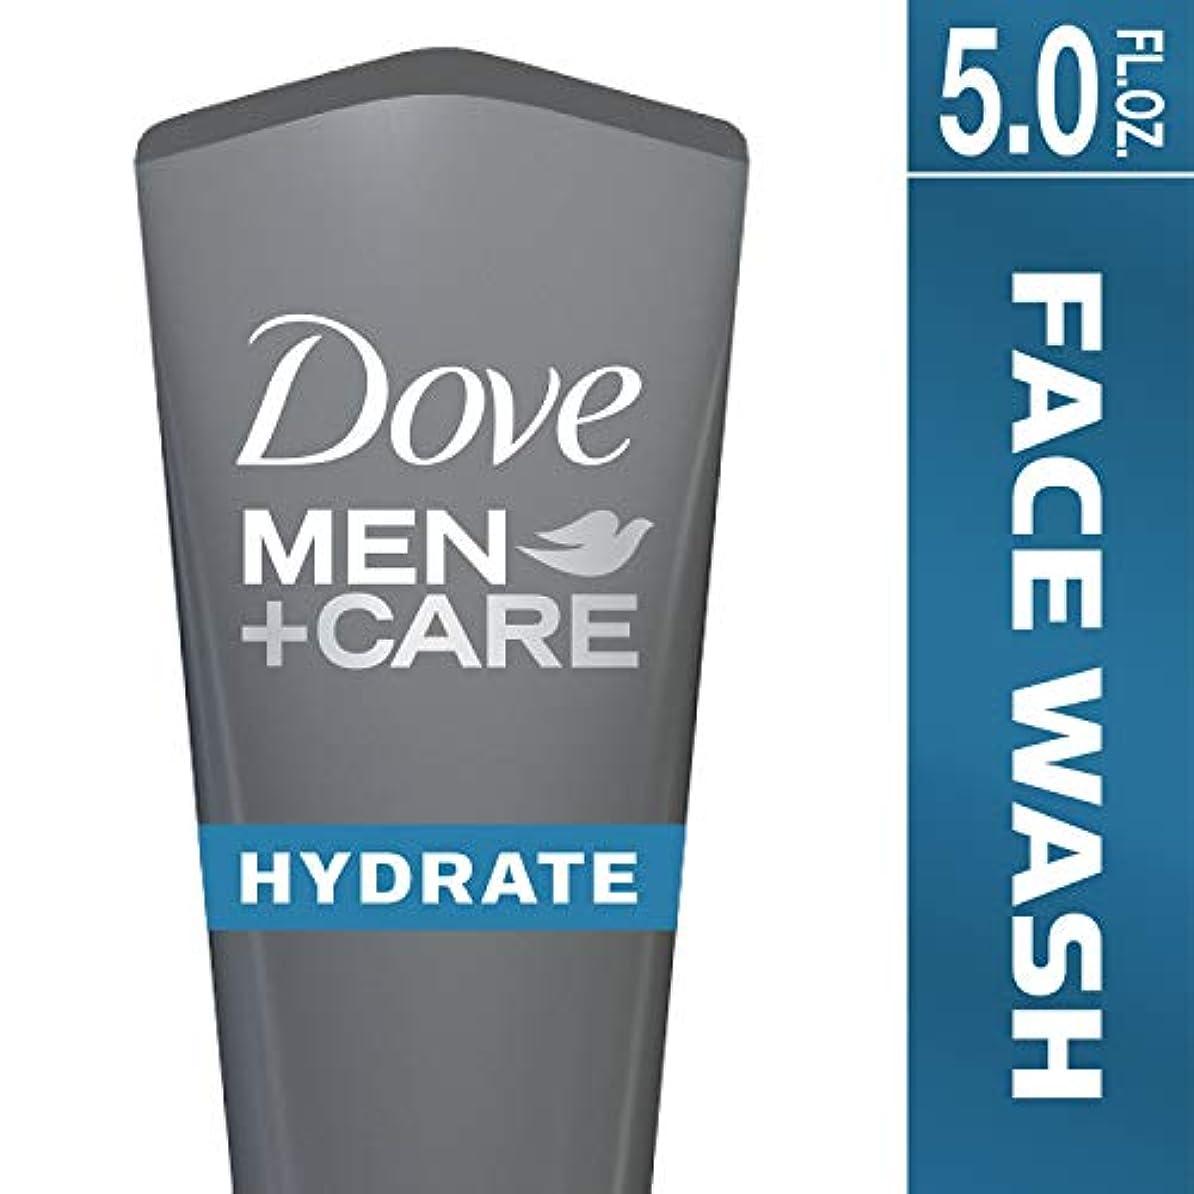 Dove Men+Care フェイスウォッシュ 保湿+ 147.9ml (5オンス) 147.9ml (5オンス)